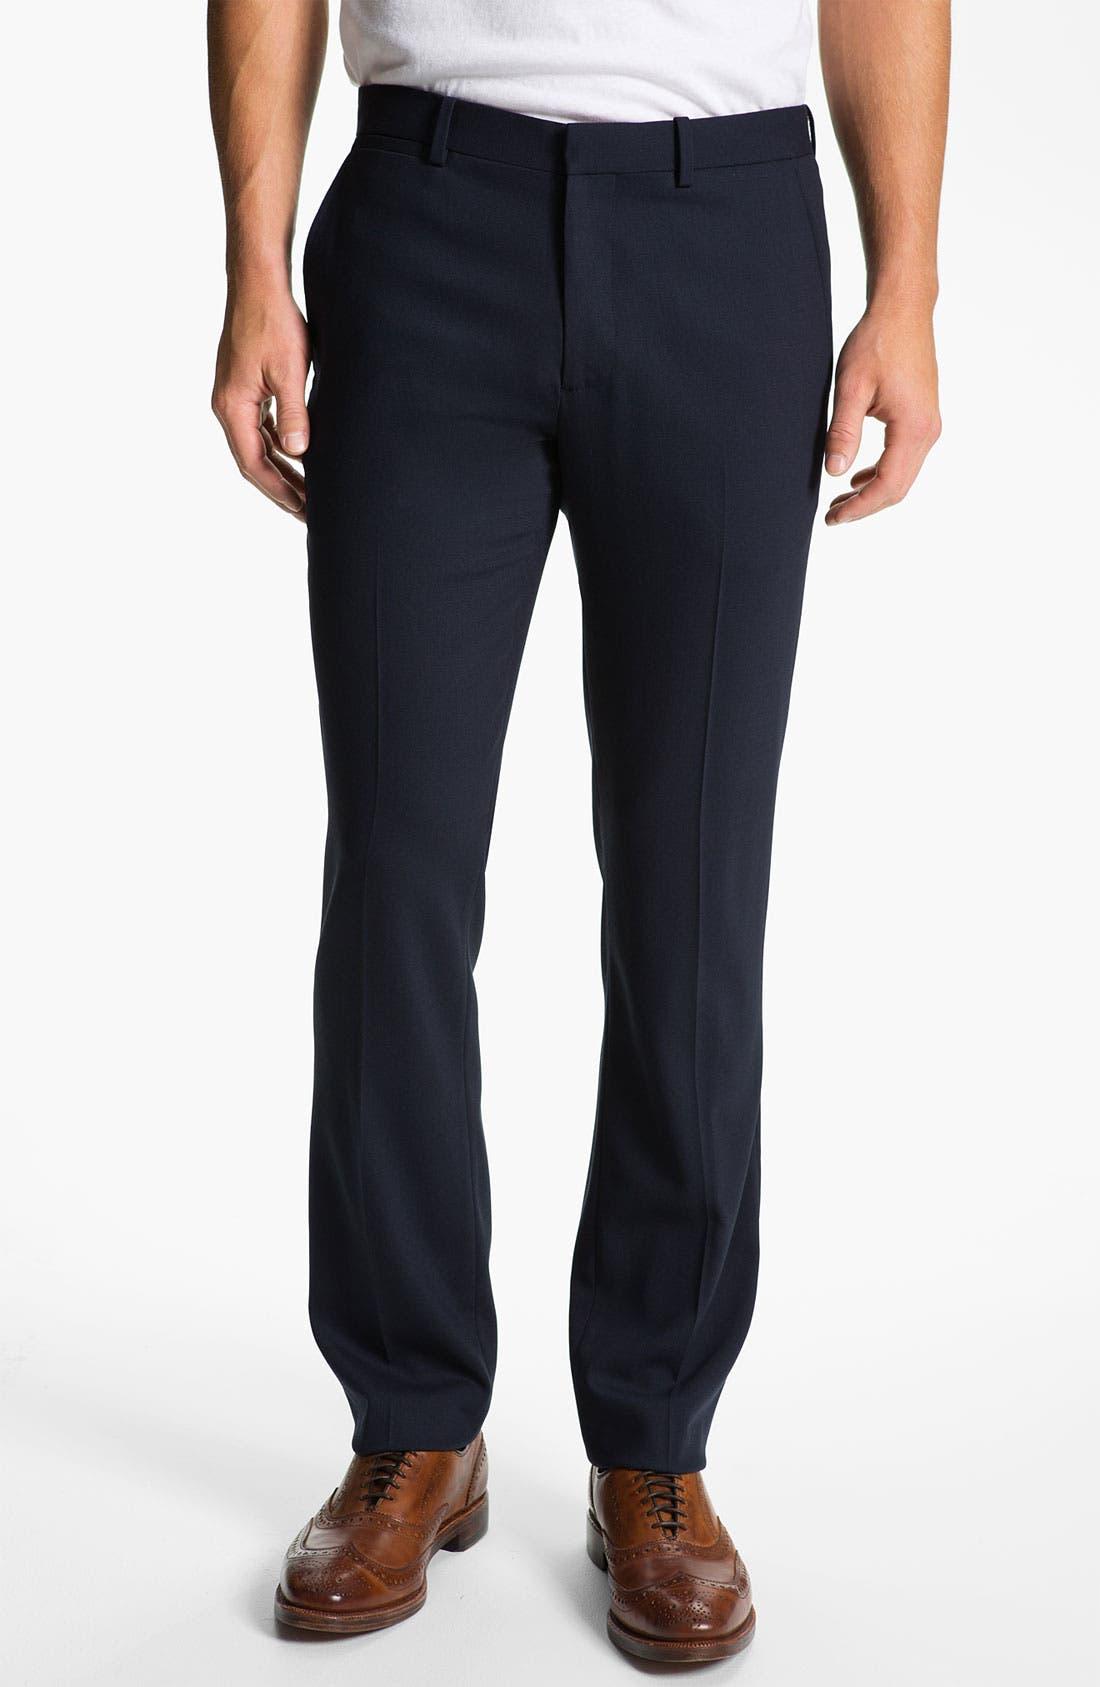 Alternate Image 1 Selected - Theory 'Marlo Revelstoke' Straight Leg Pants